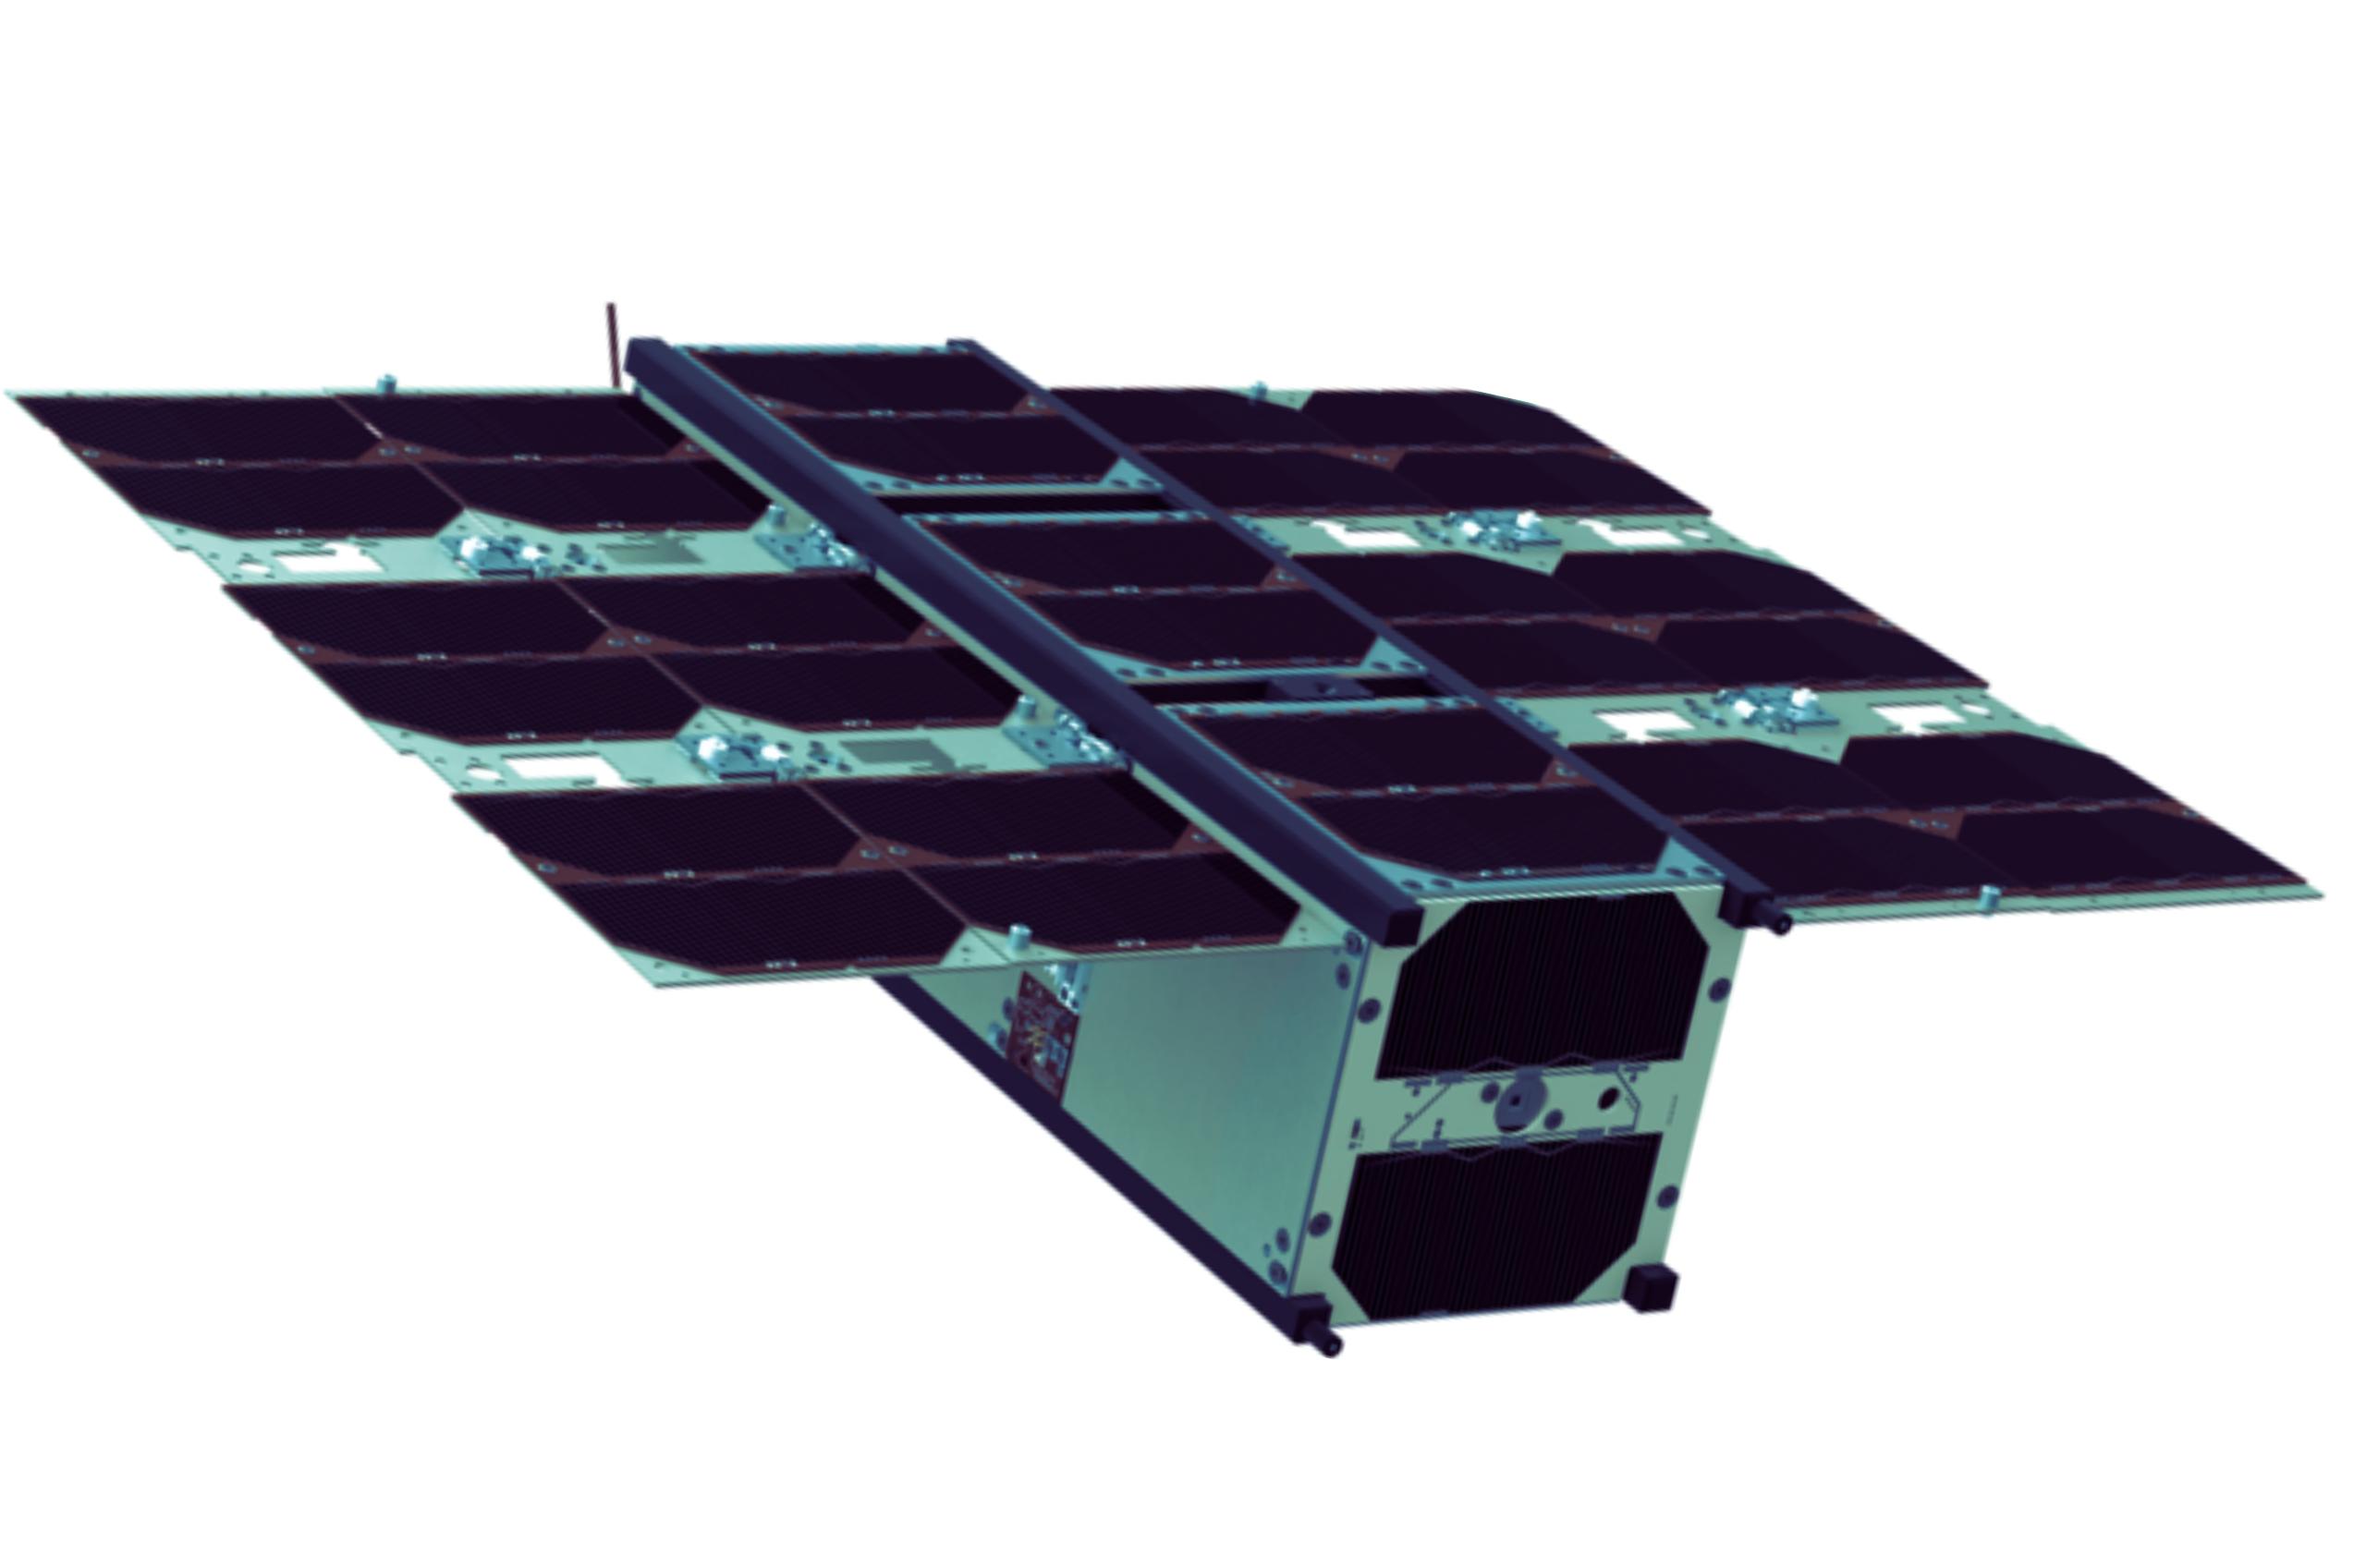 Xplora 3U Cubesat